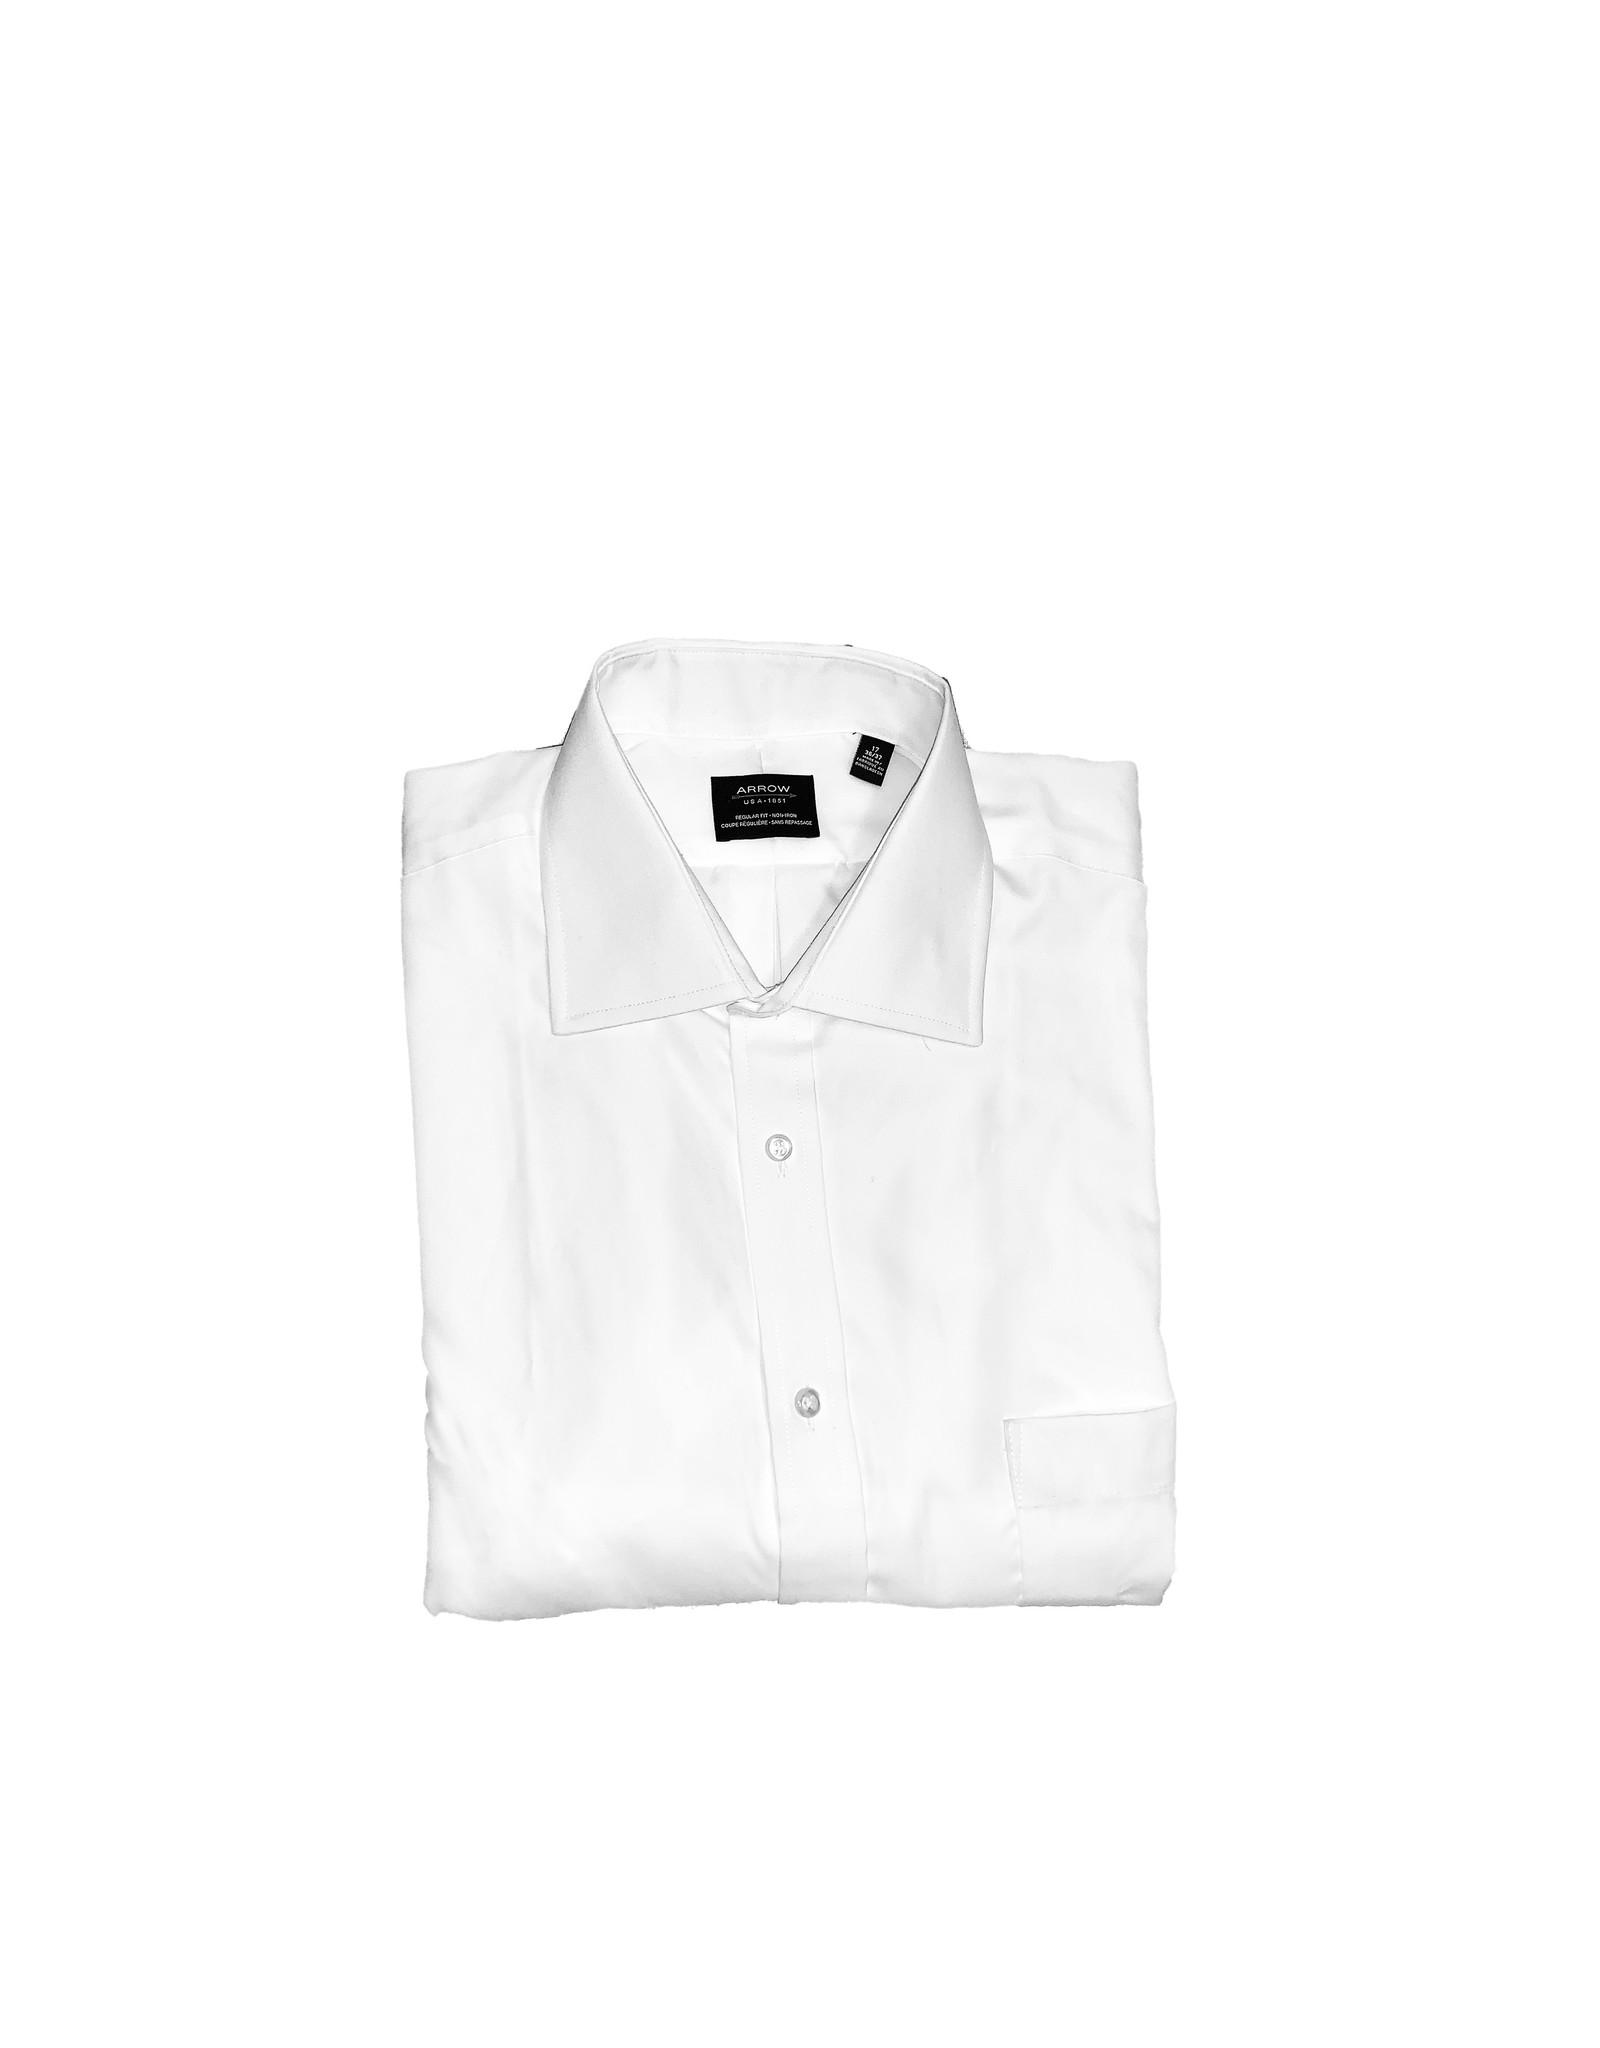 ARROW ARROW  Dress Shirt  Cotton Non-Iron  Size 36/37